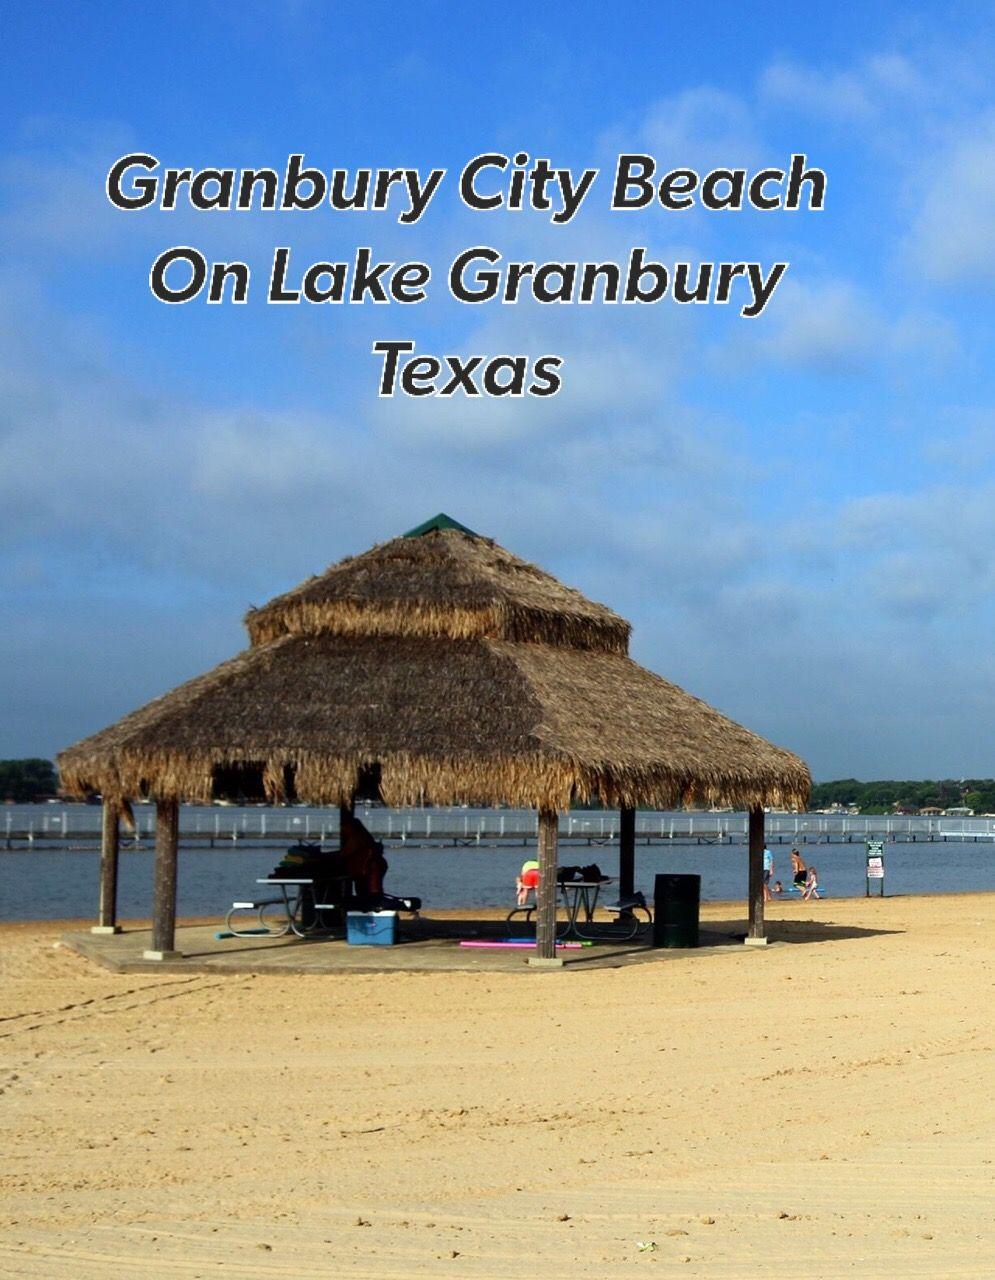 Granbury City Beach On Lake Granbury Texas Follow Fosterginger Pinterest For More Pins Like This No Pin Limits T Texas Lakes City Beach Granbury Texas